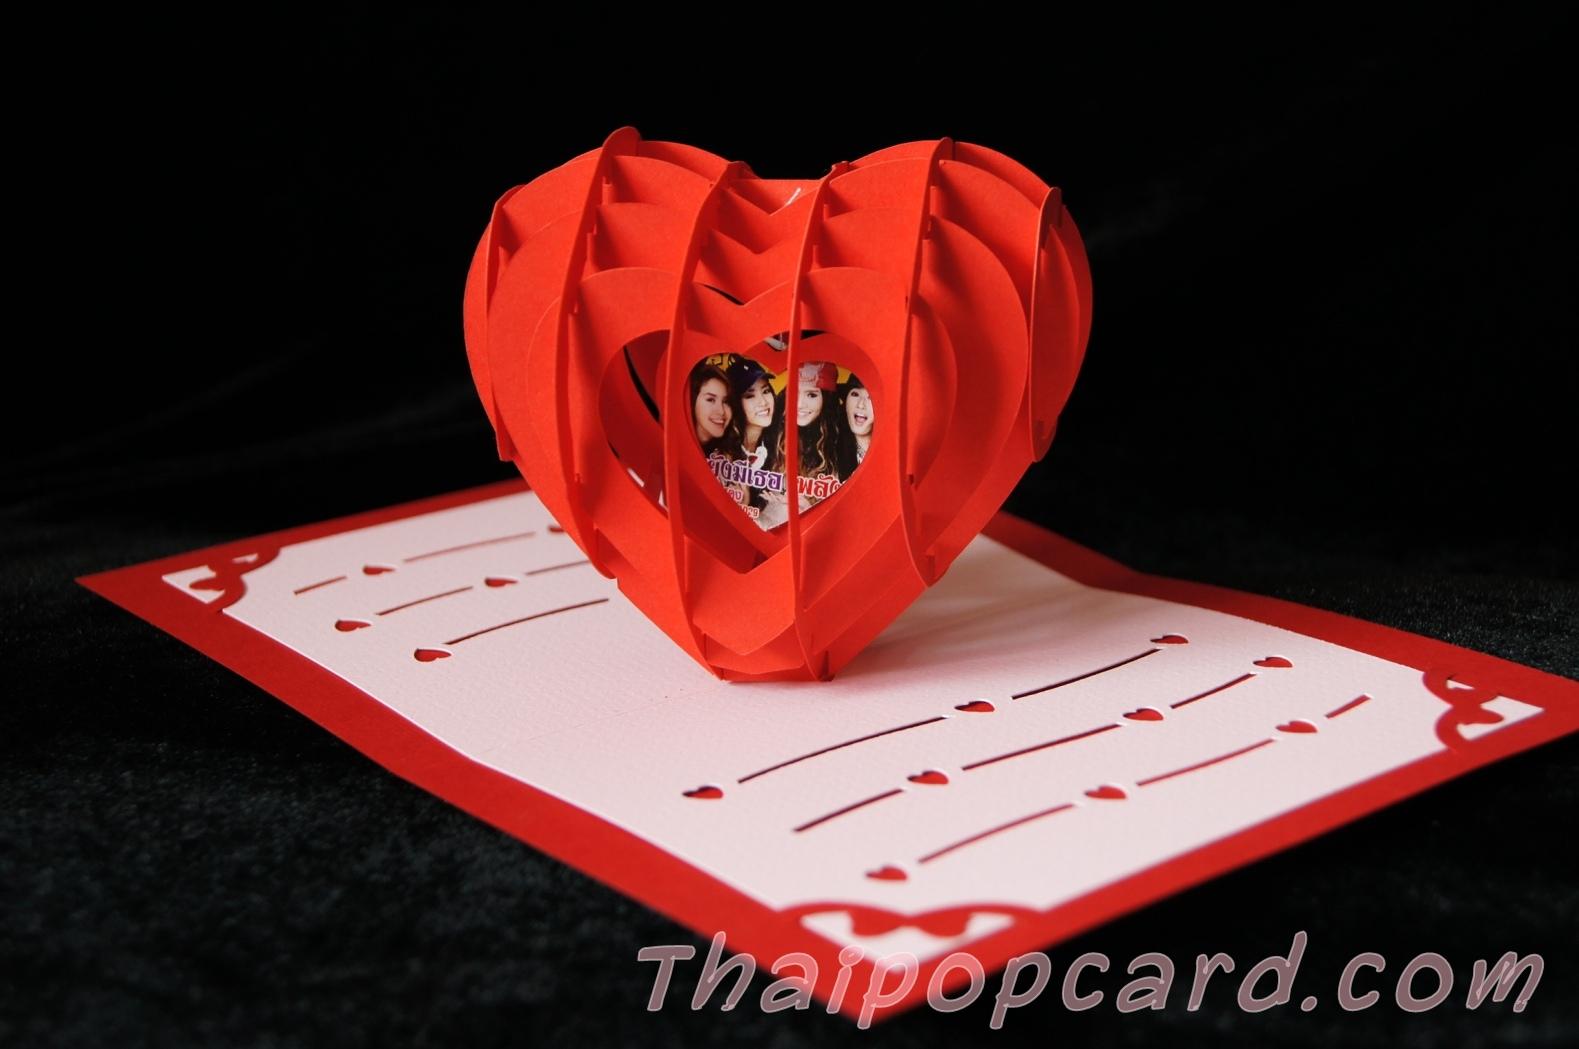 A03 การ์ดป๊อปอัพ หัวใจสานใส่รูปด้านในได้